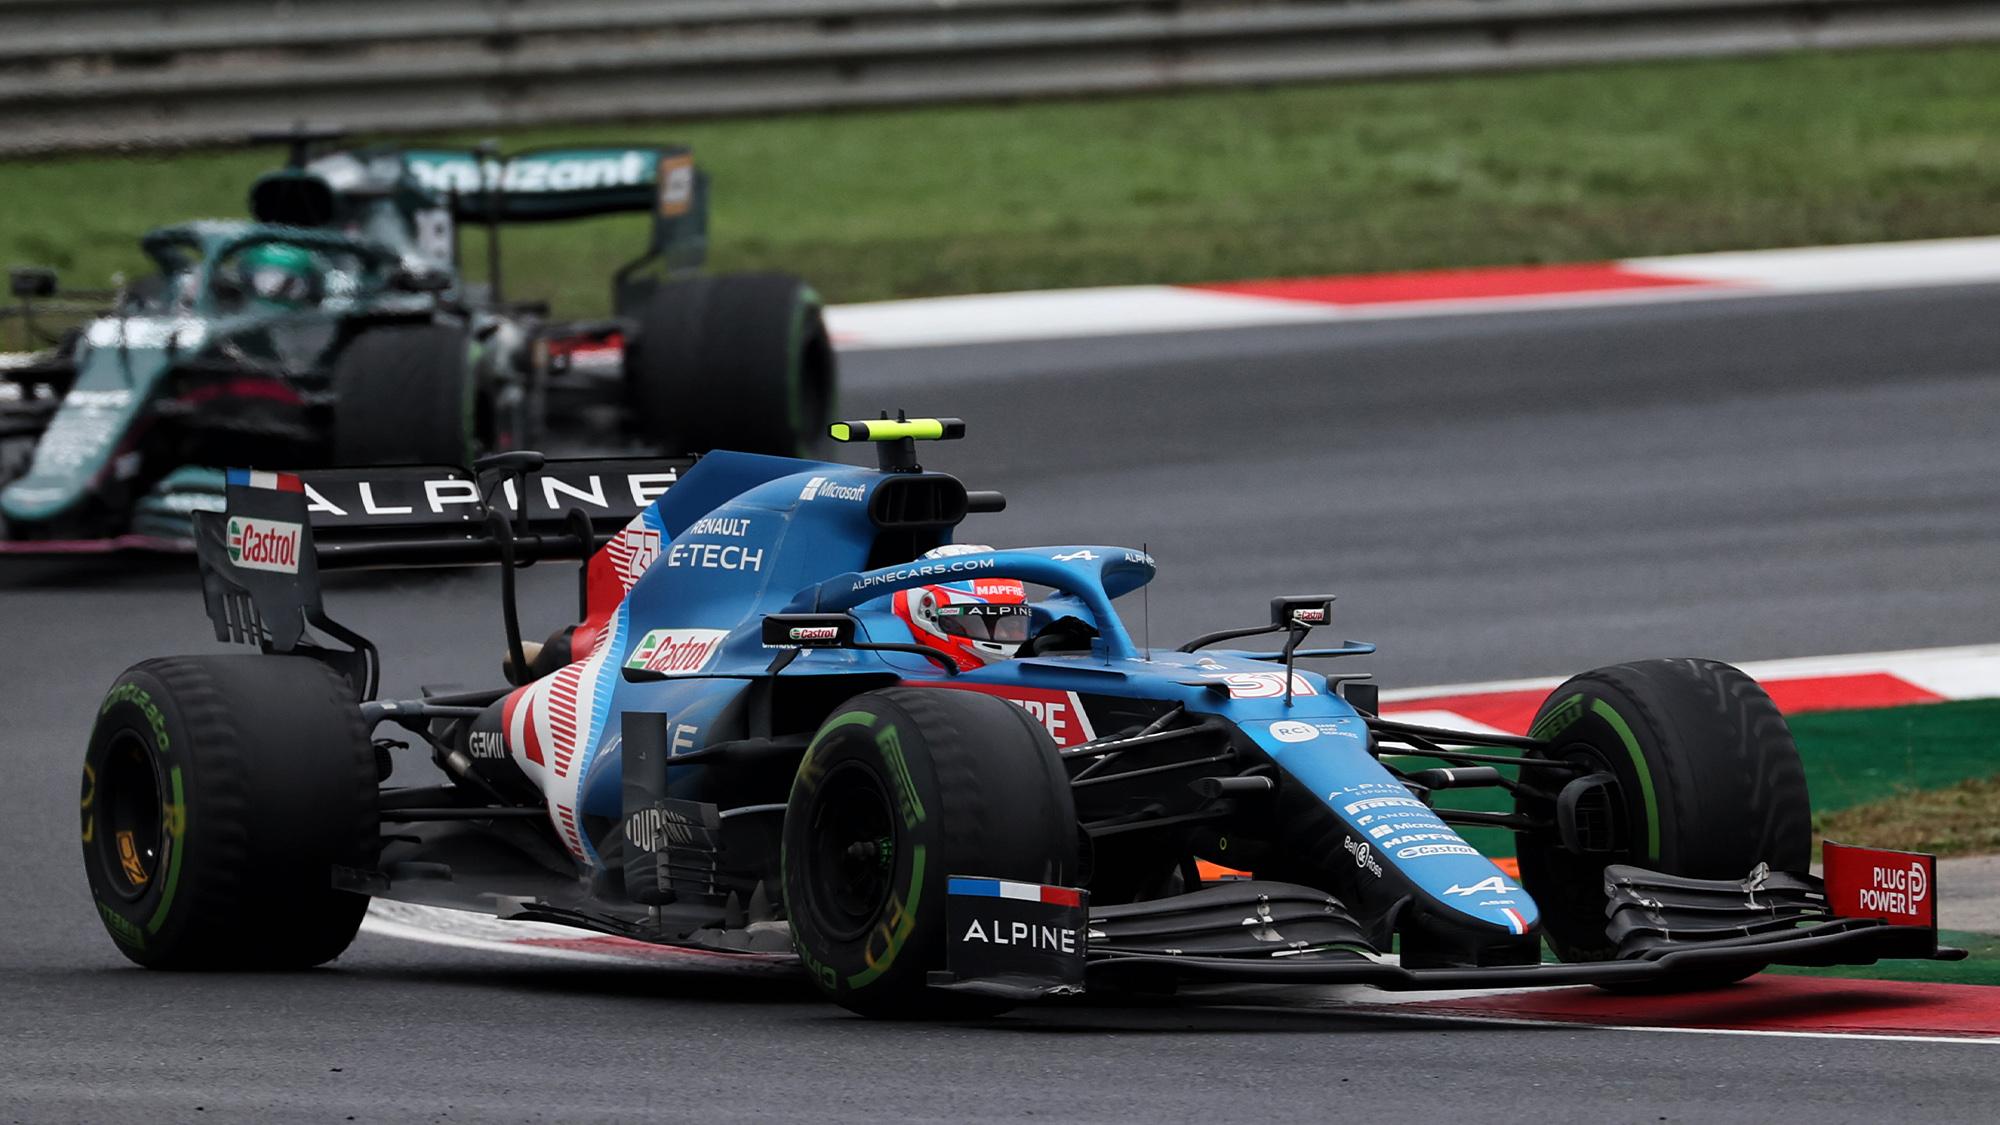 Esteban Ocon with bald tyres in the 2021 Turkish Grand Prix